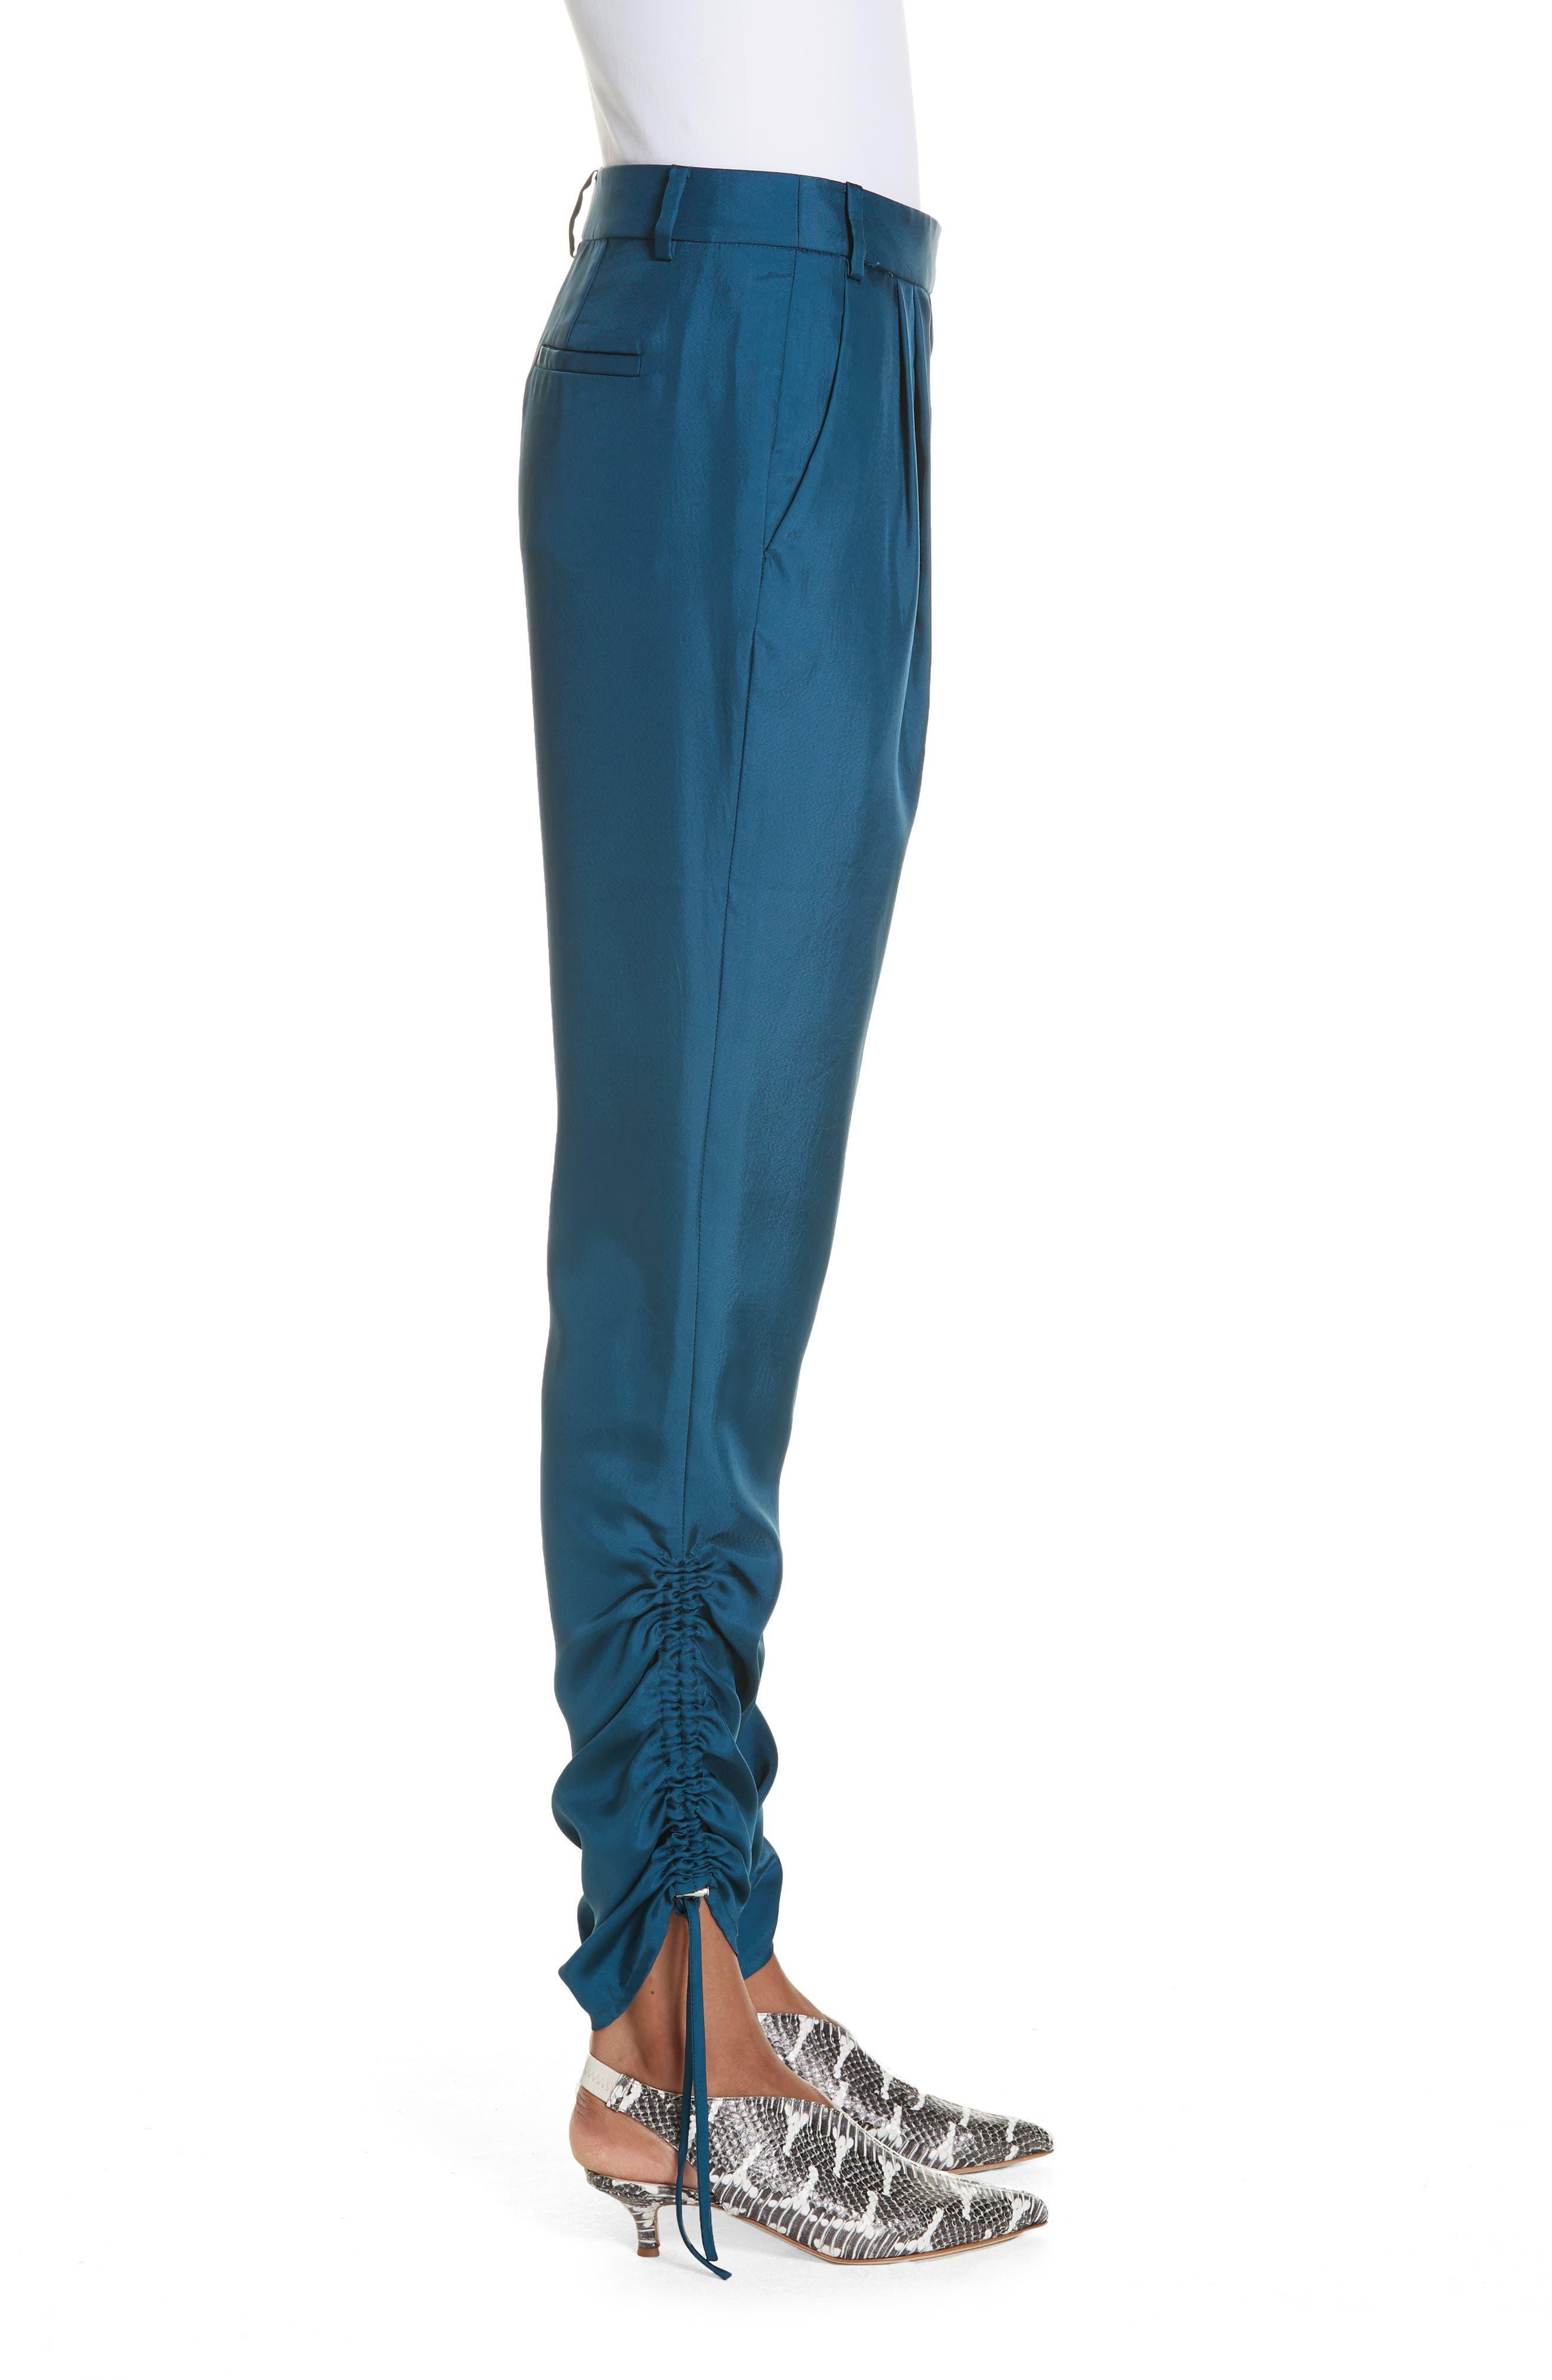 Mendini Twill Shirred Pants,                             Alternate thumbnail 3, color,                             TEAL BLUE